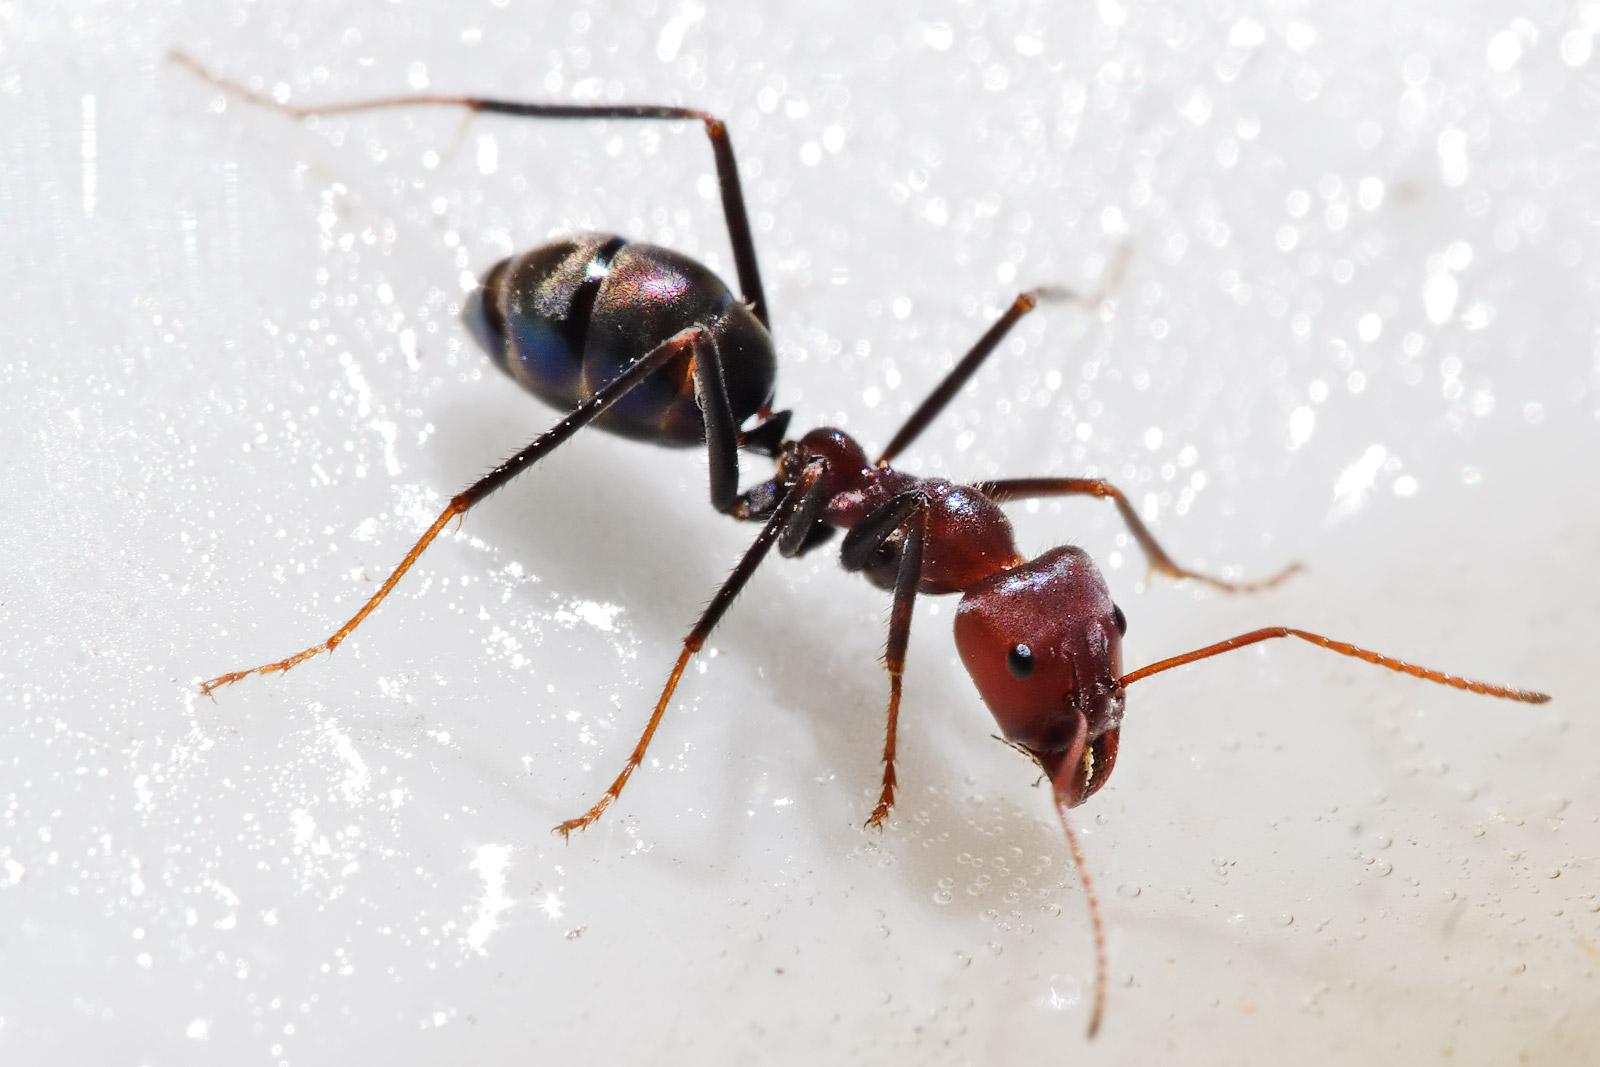 a stinking ant. grrr...